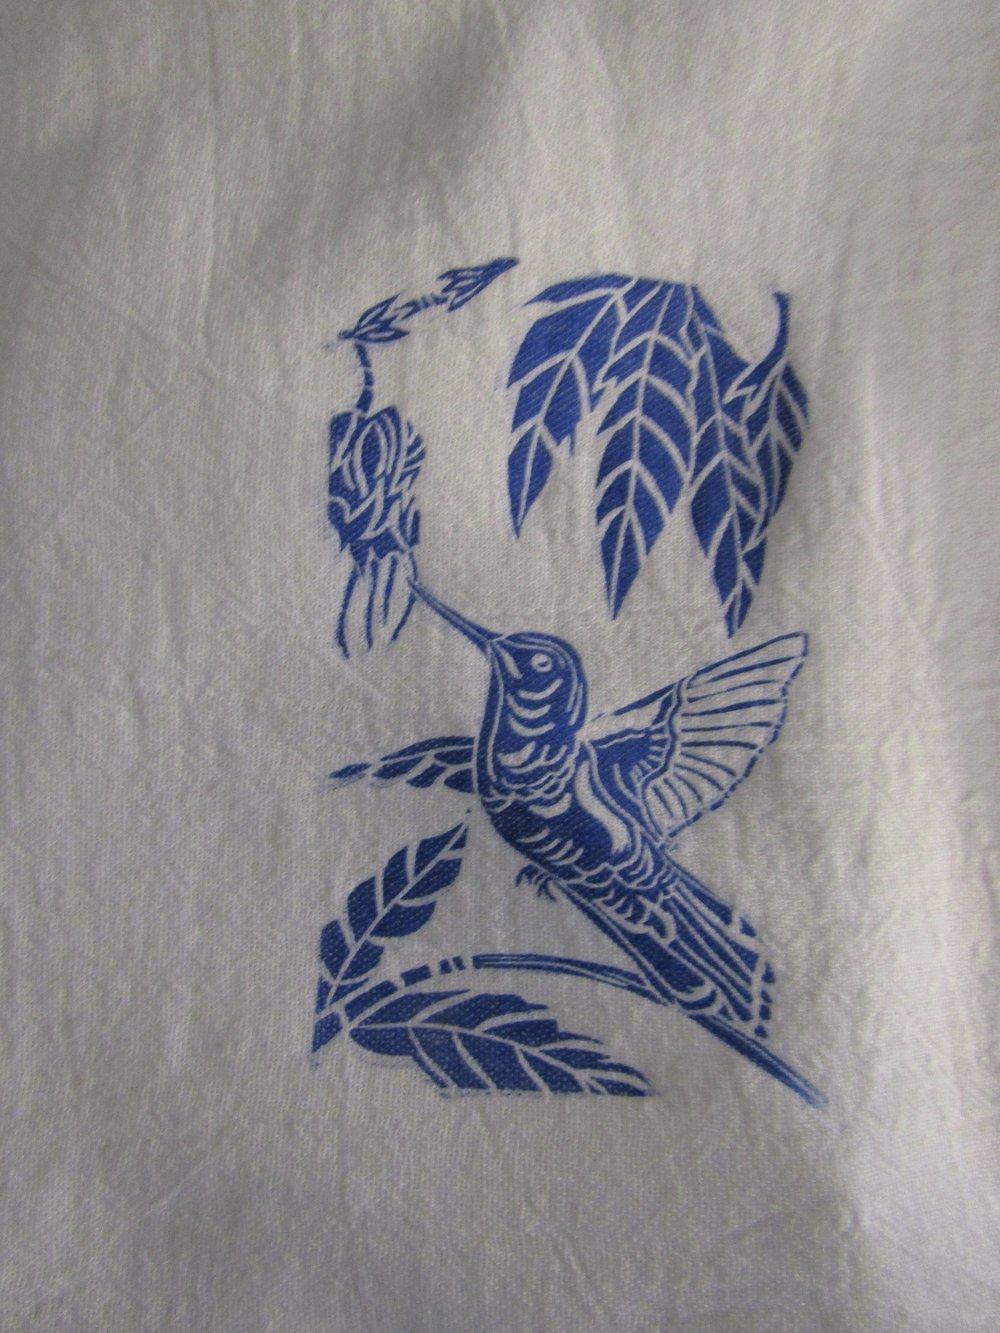 A little hummingbird adorns this towel.